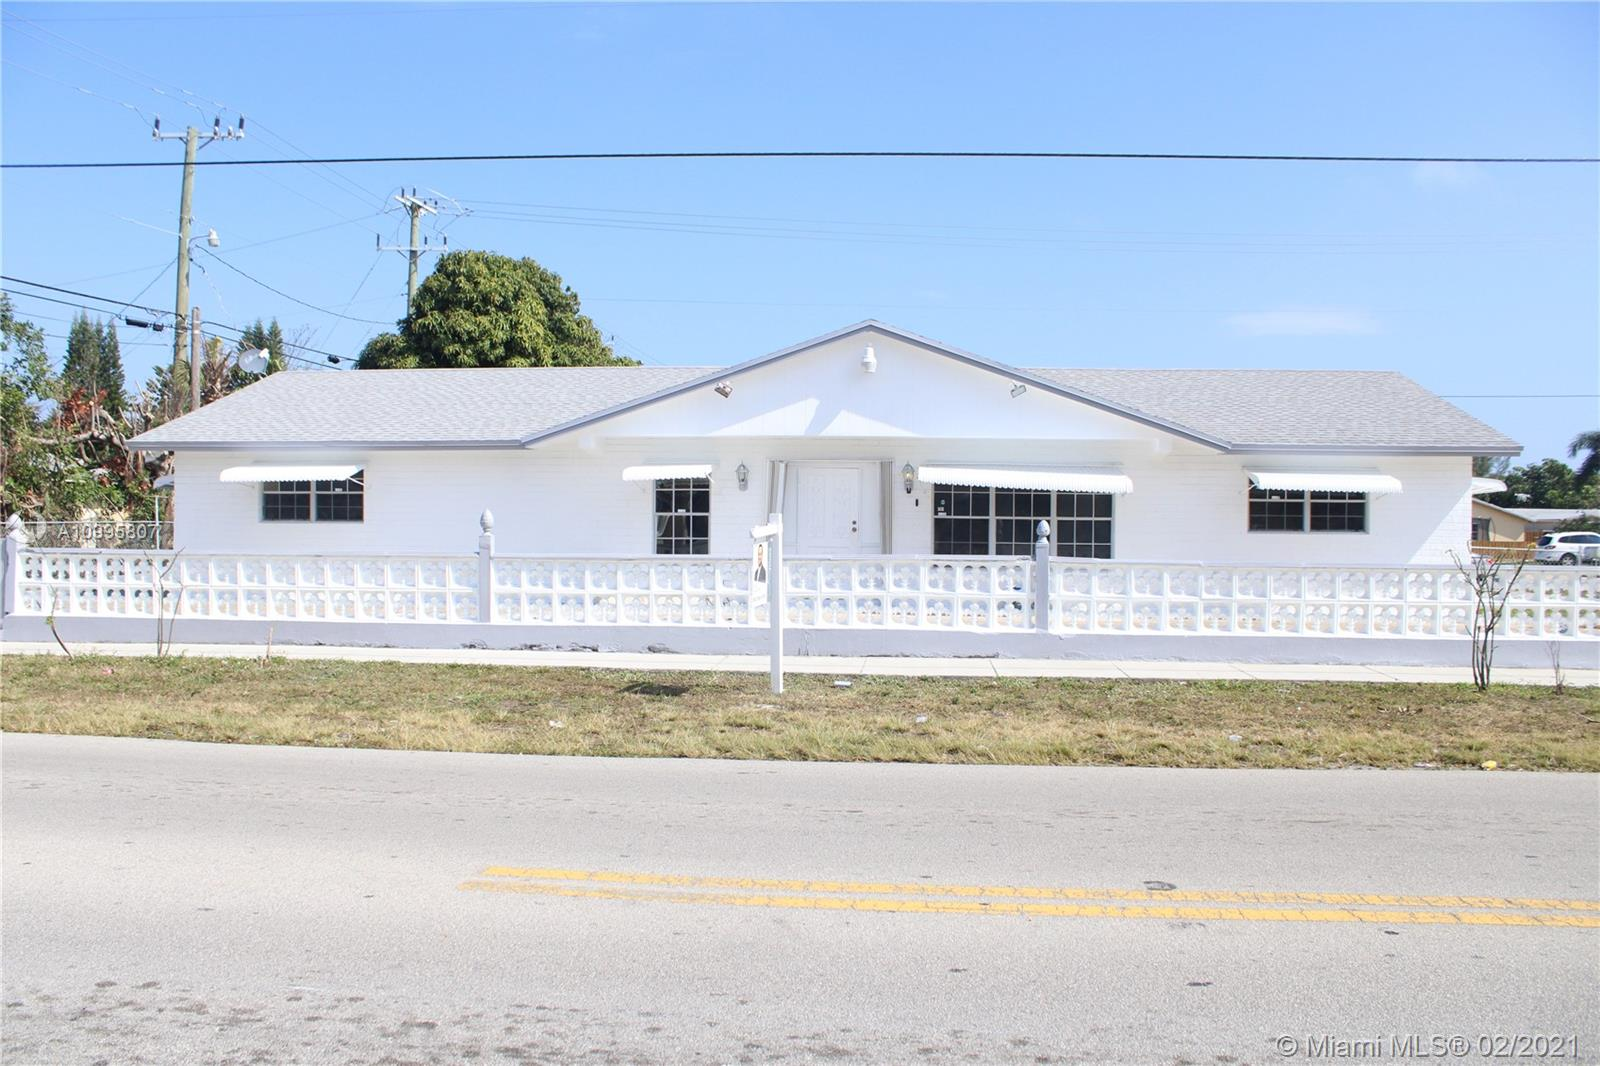 Pompano Beach, 1501 NE 39th St, Pompano Beach, Florida 33064